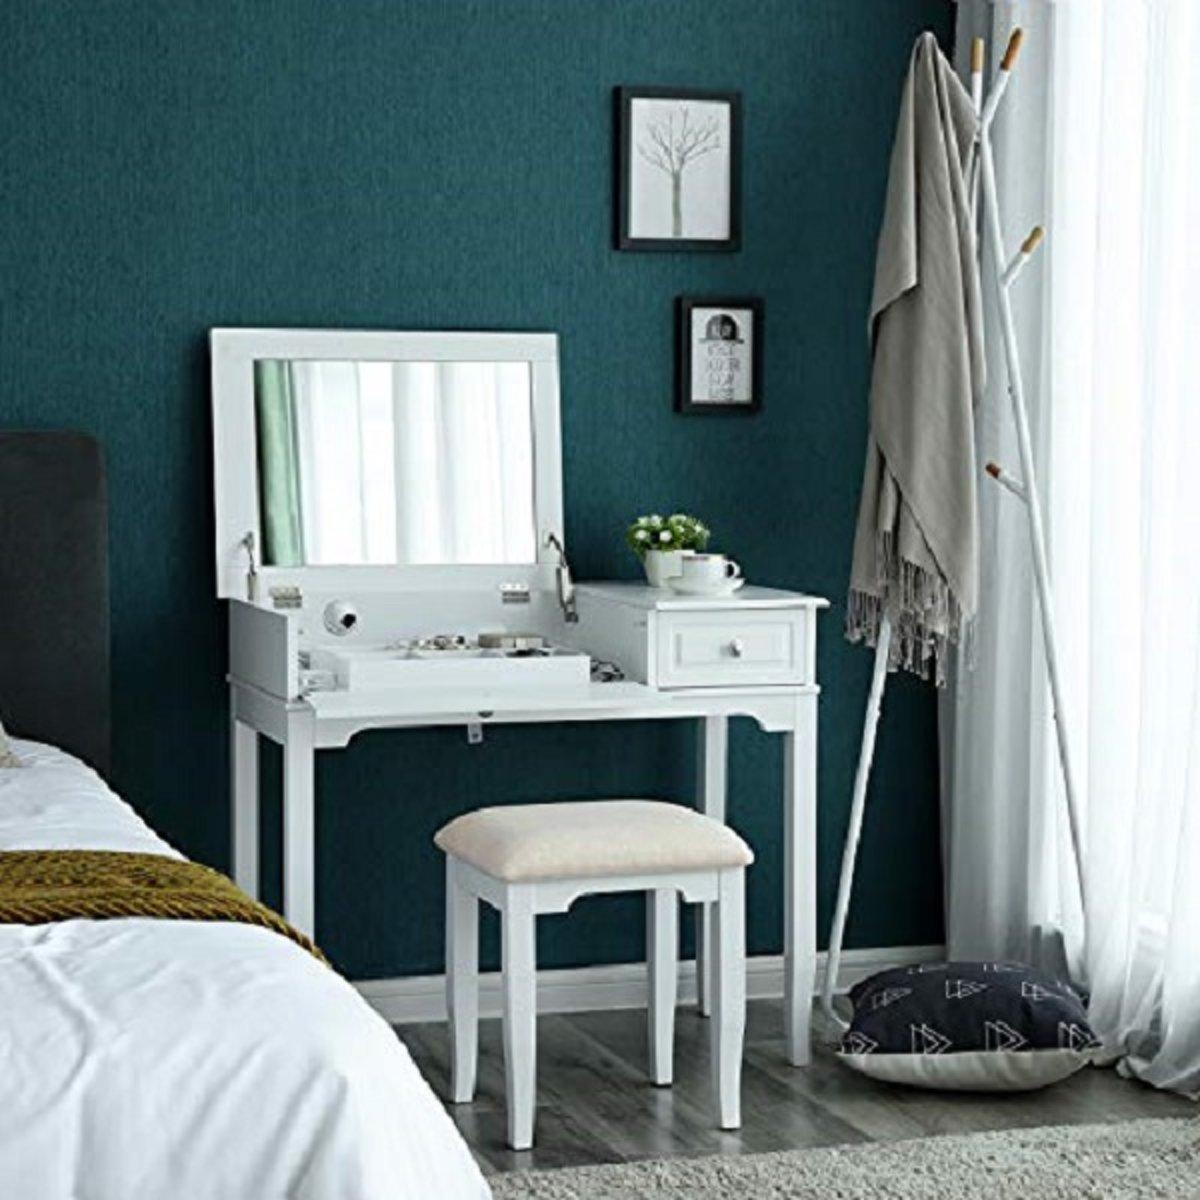 Moderne Witte Kaptafel.Kaptafel Groot Grote Spiegel Slaapkamer